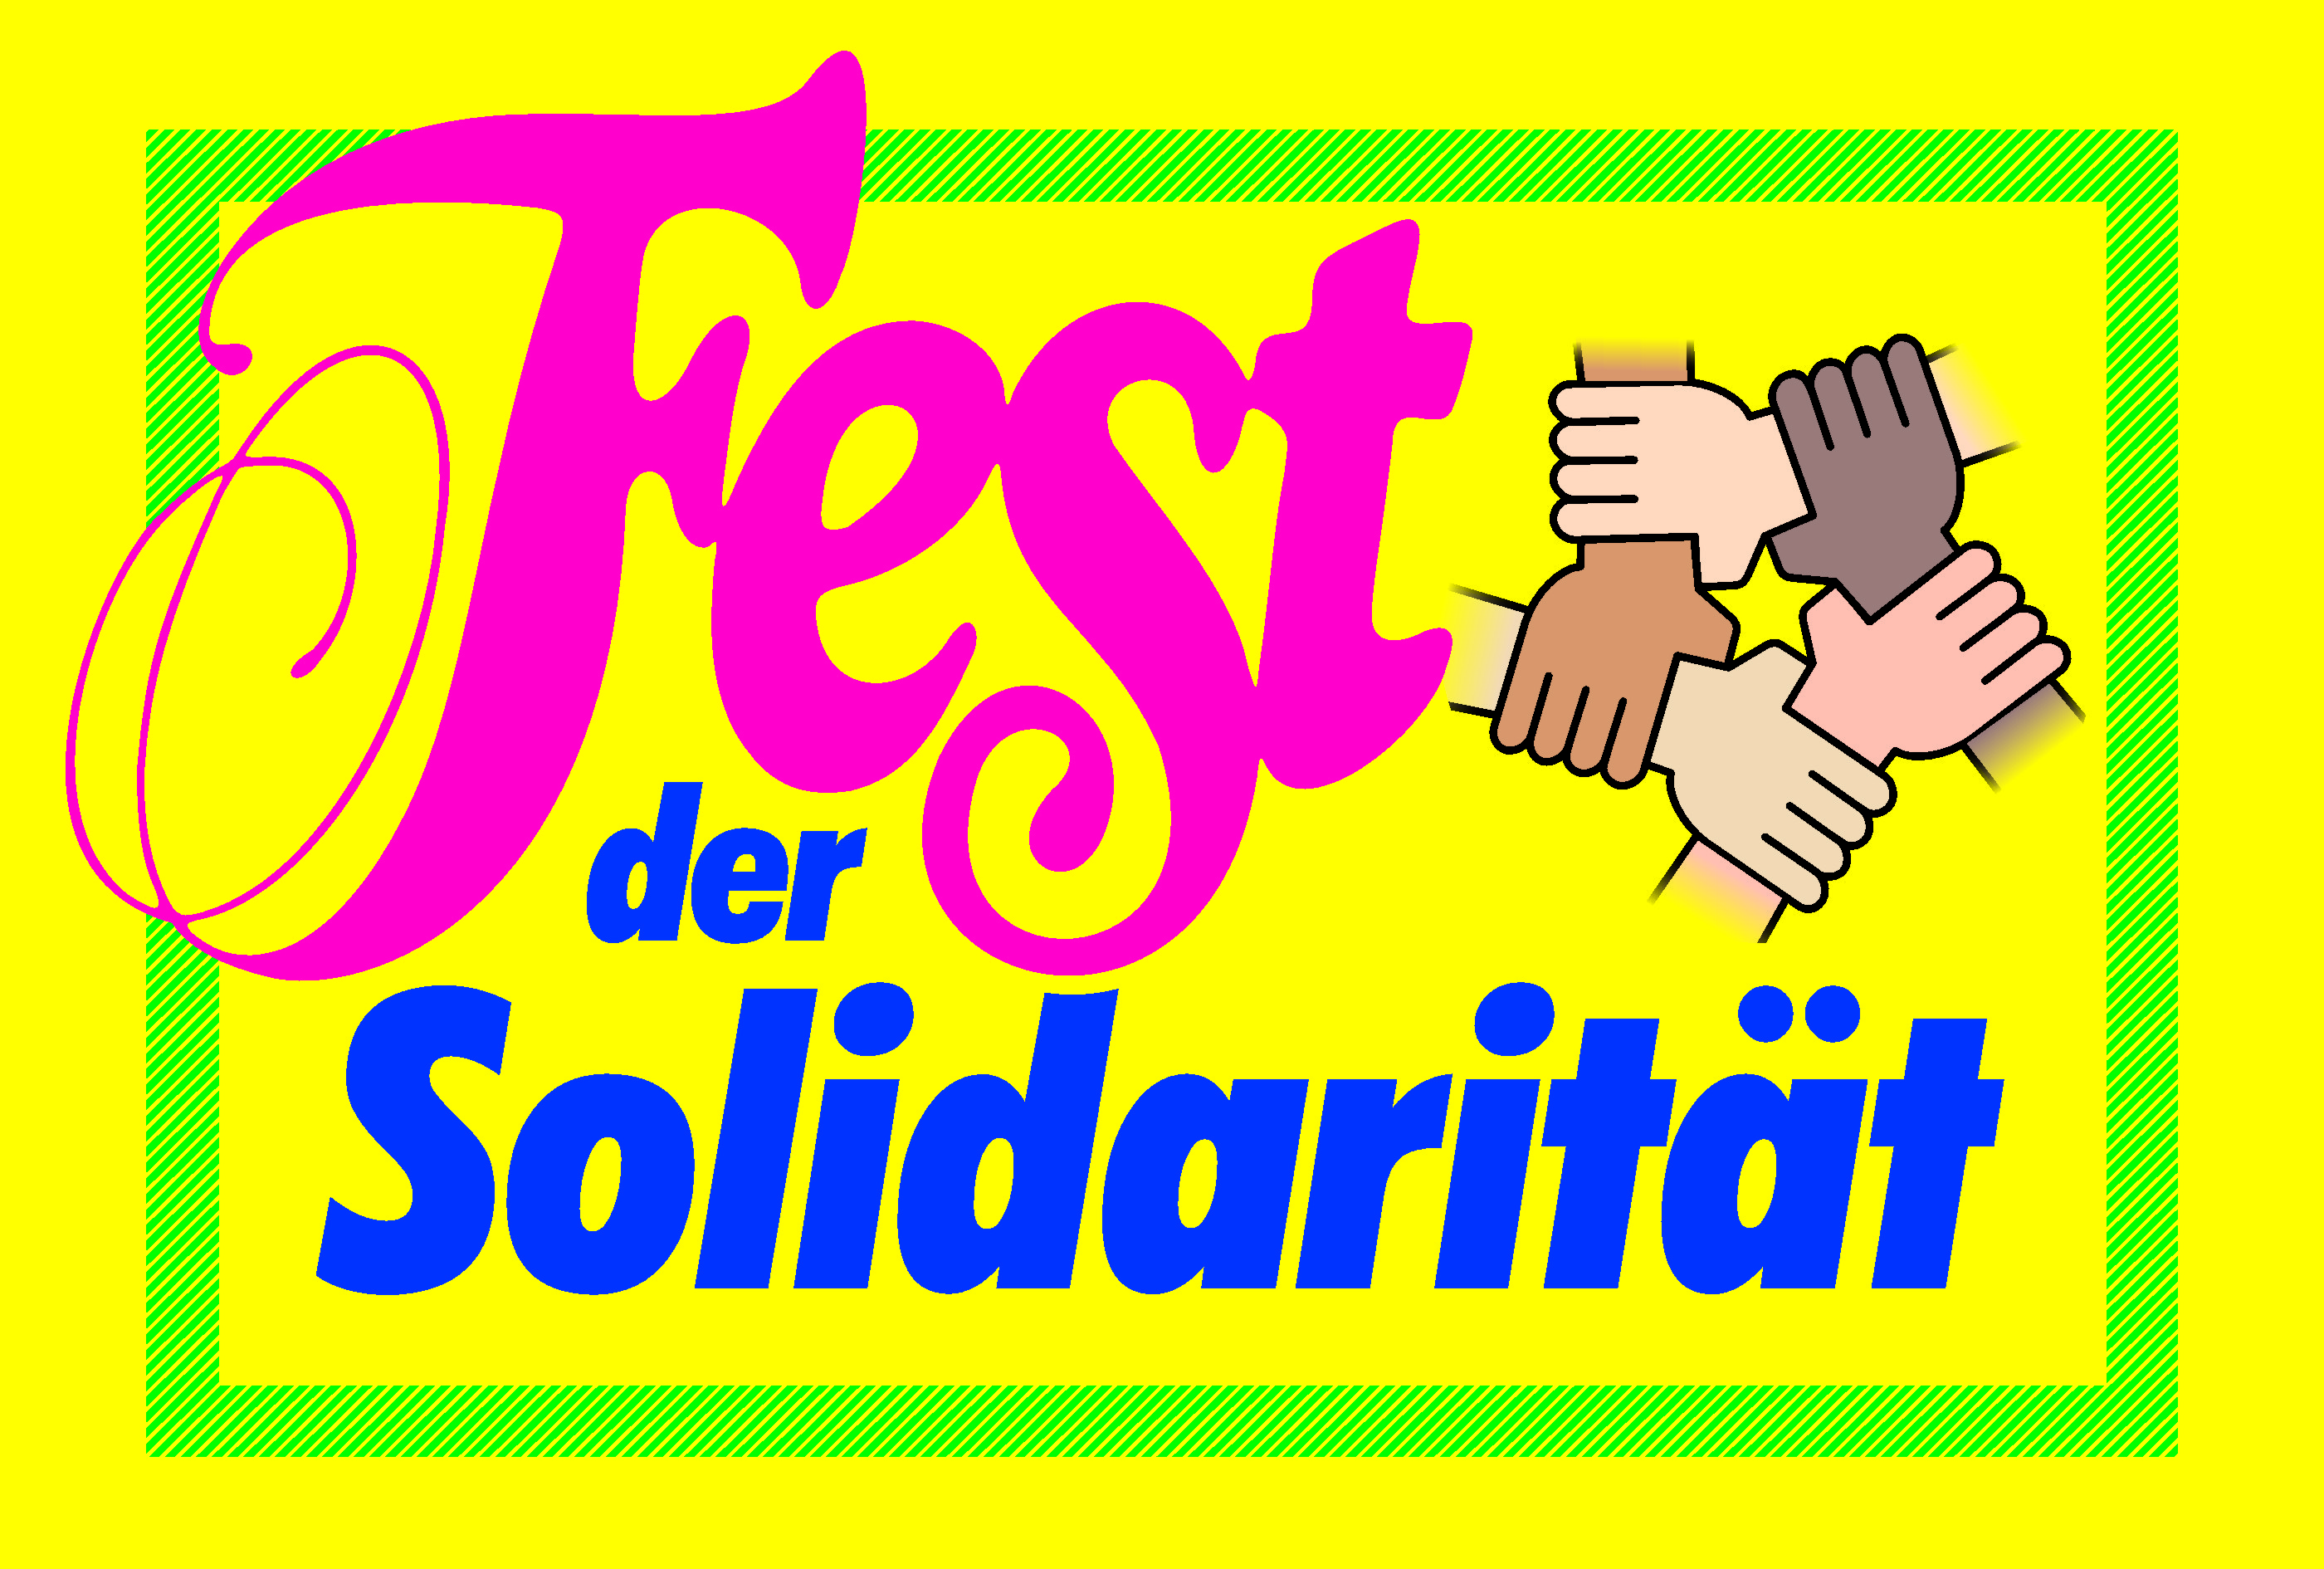 Fest der Solidarität 2019